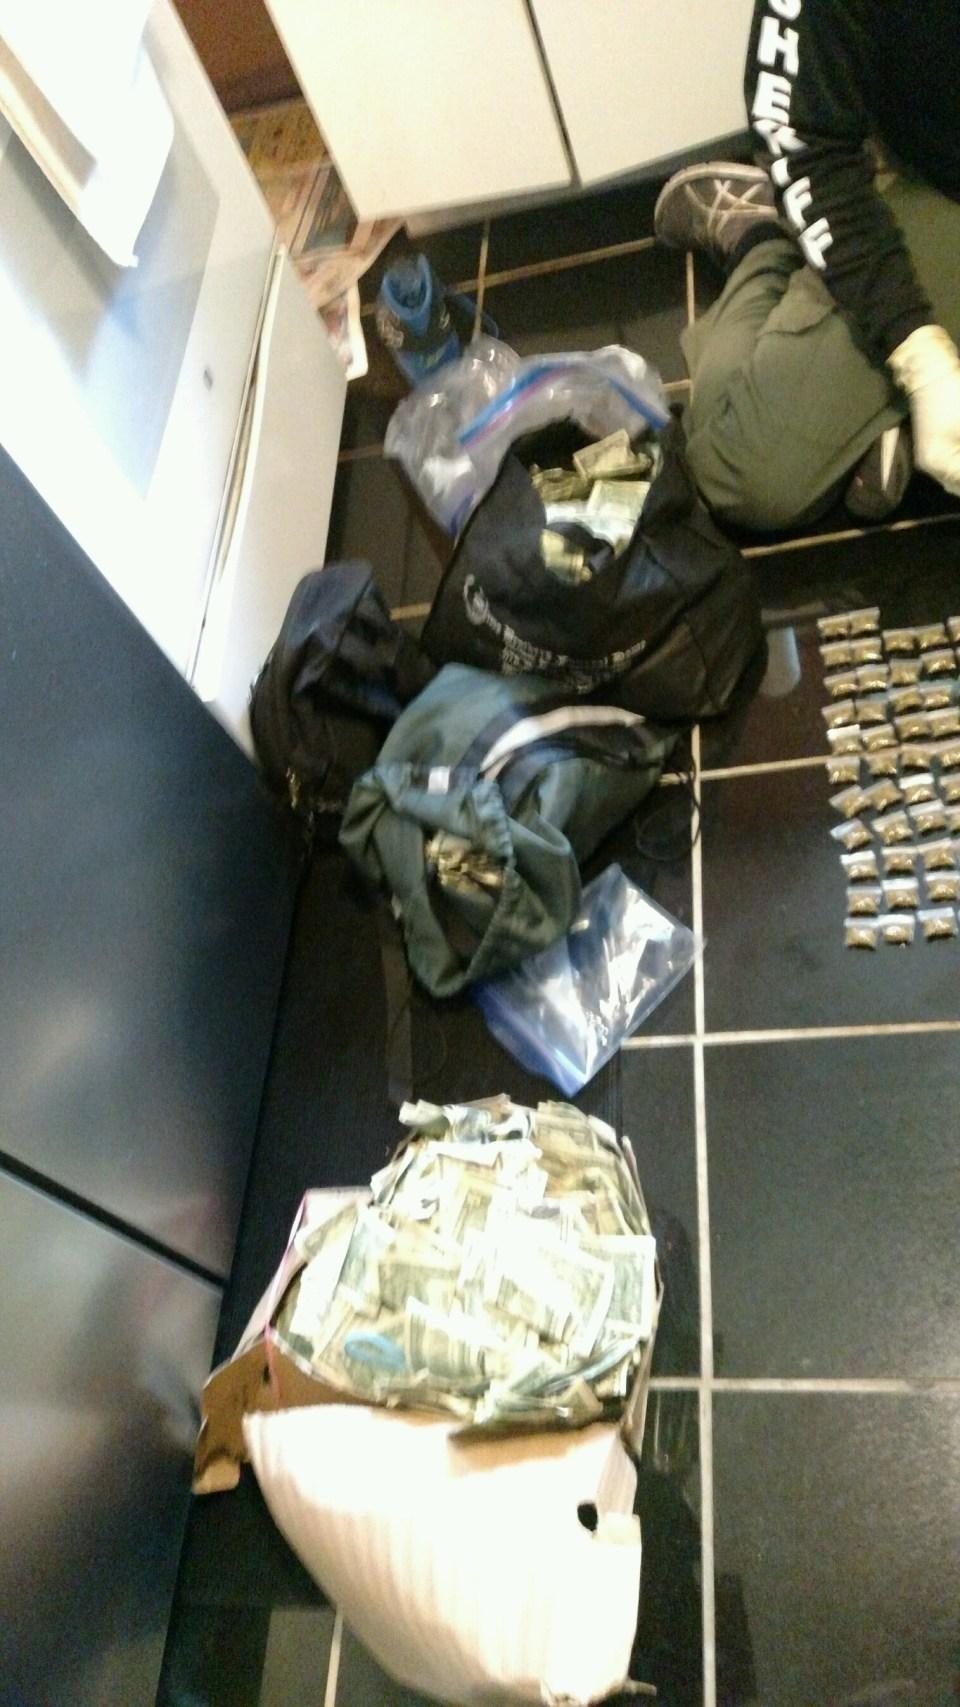 Major drug arrests aimed at curbing overdose incidents Photo: IRSO